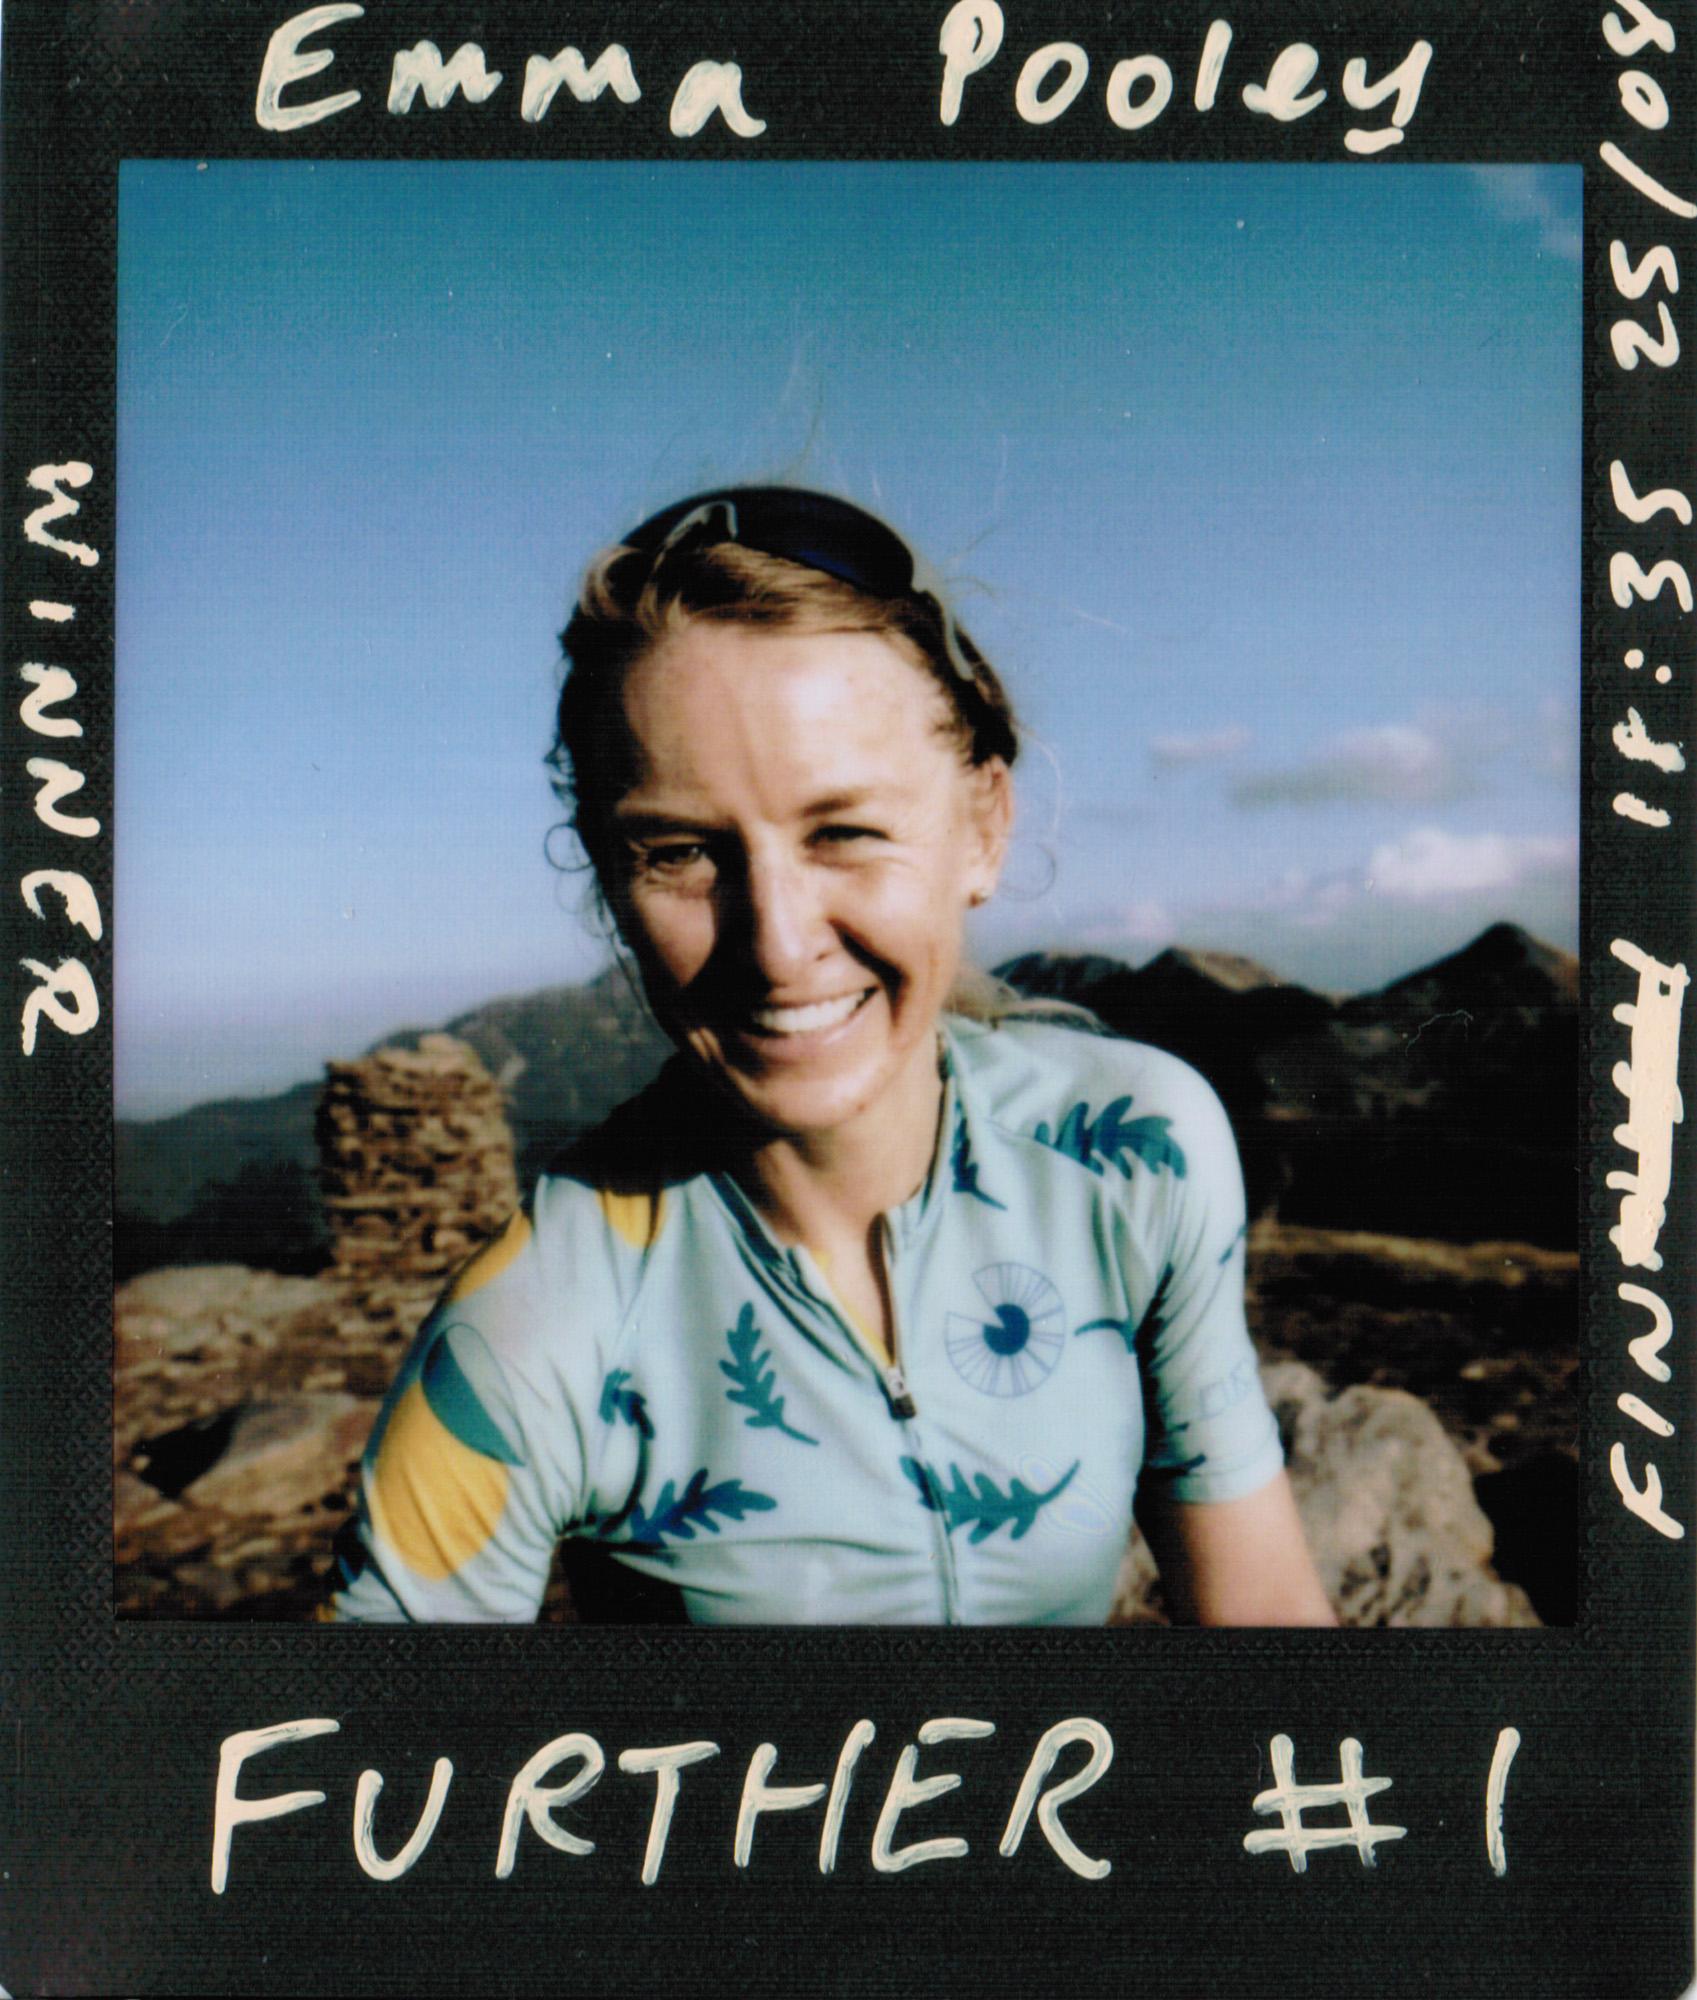 Emma Pooley / Winner